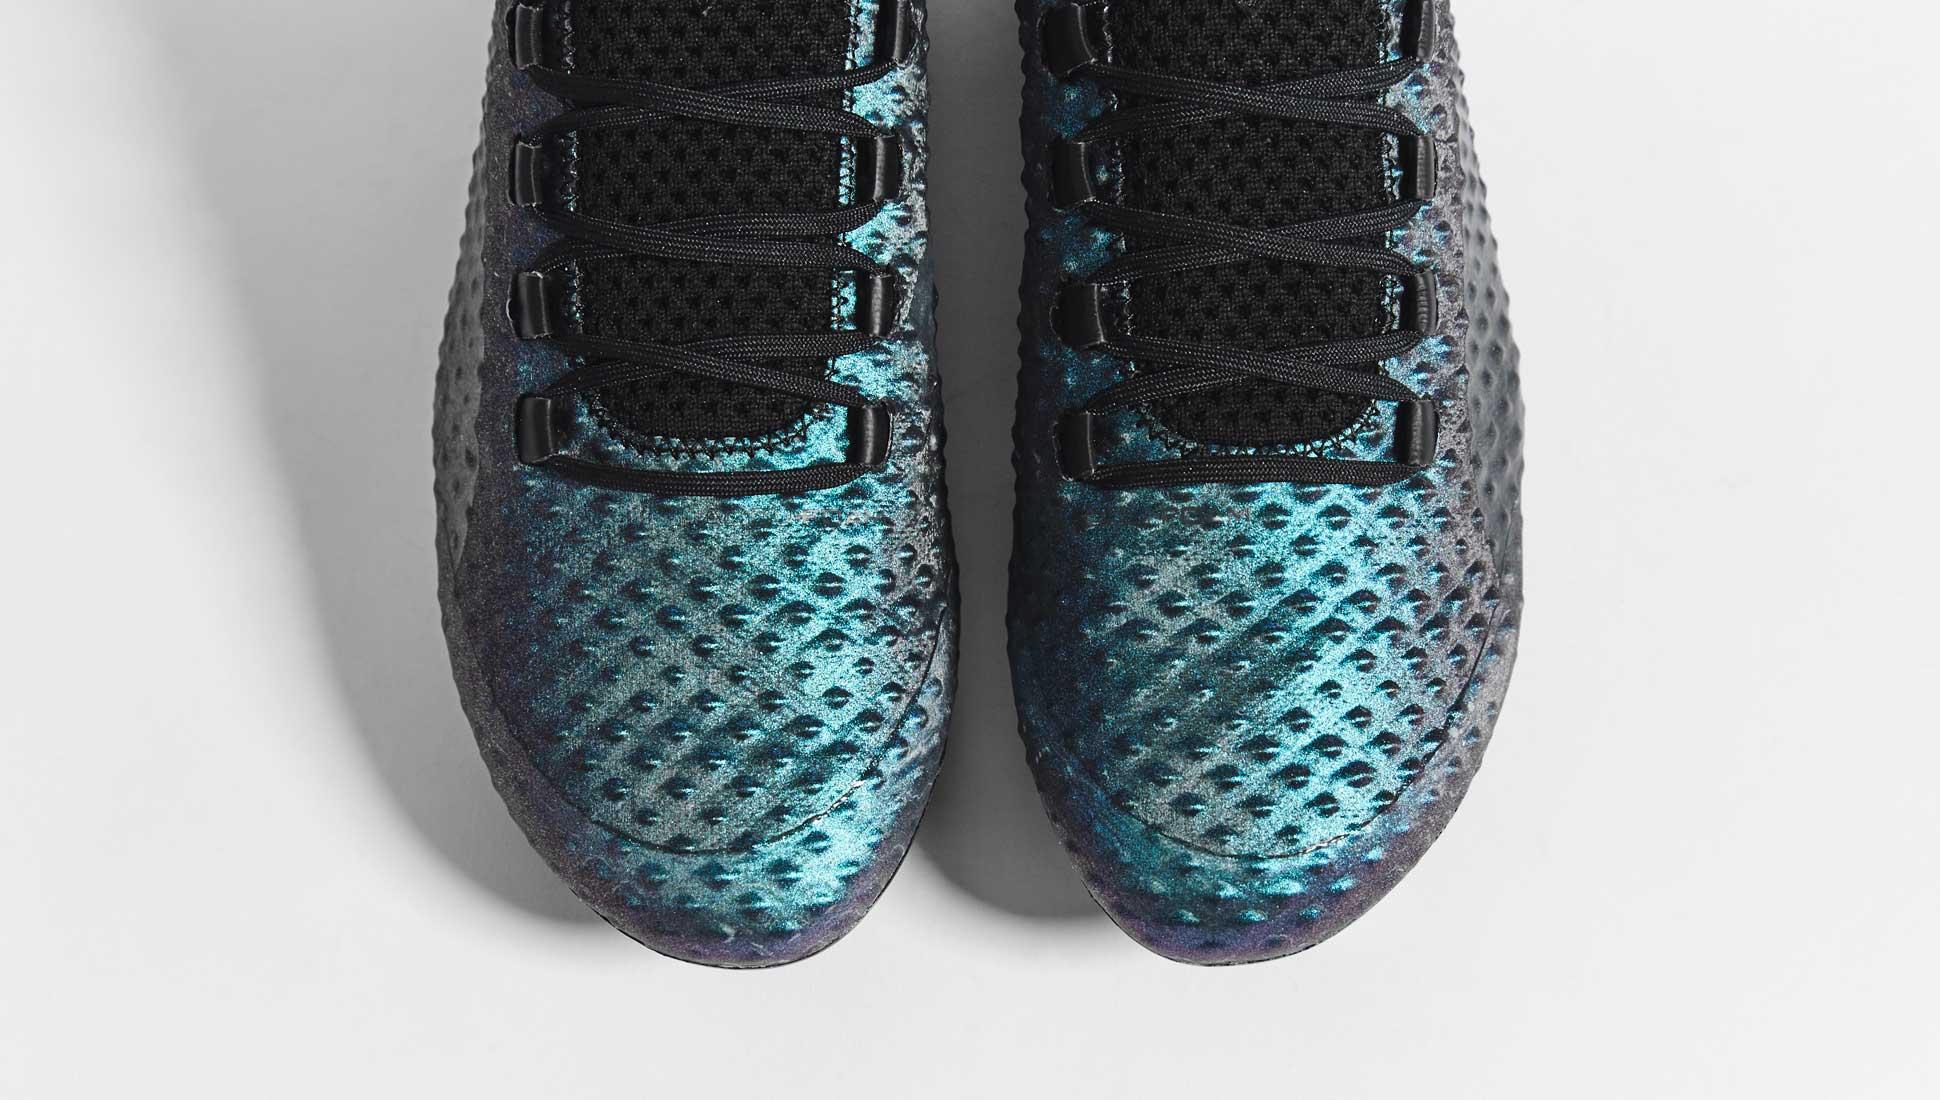 chaussures-football-Puma-evoPower-Vigor-3D-img4